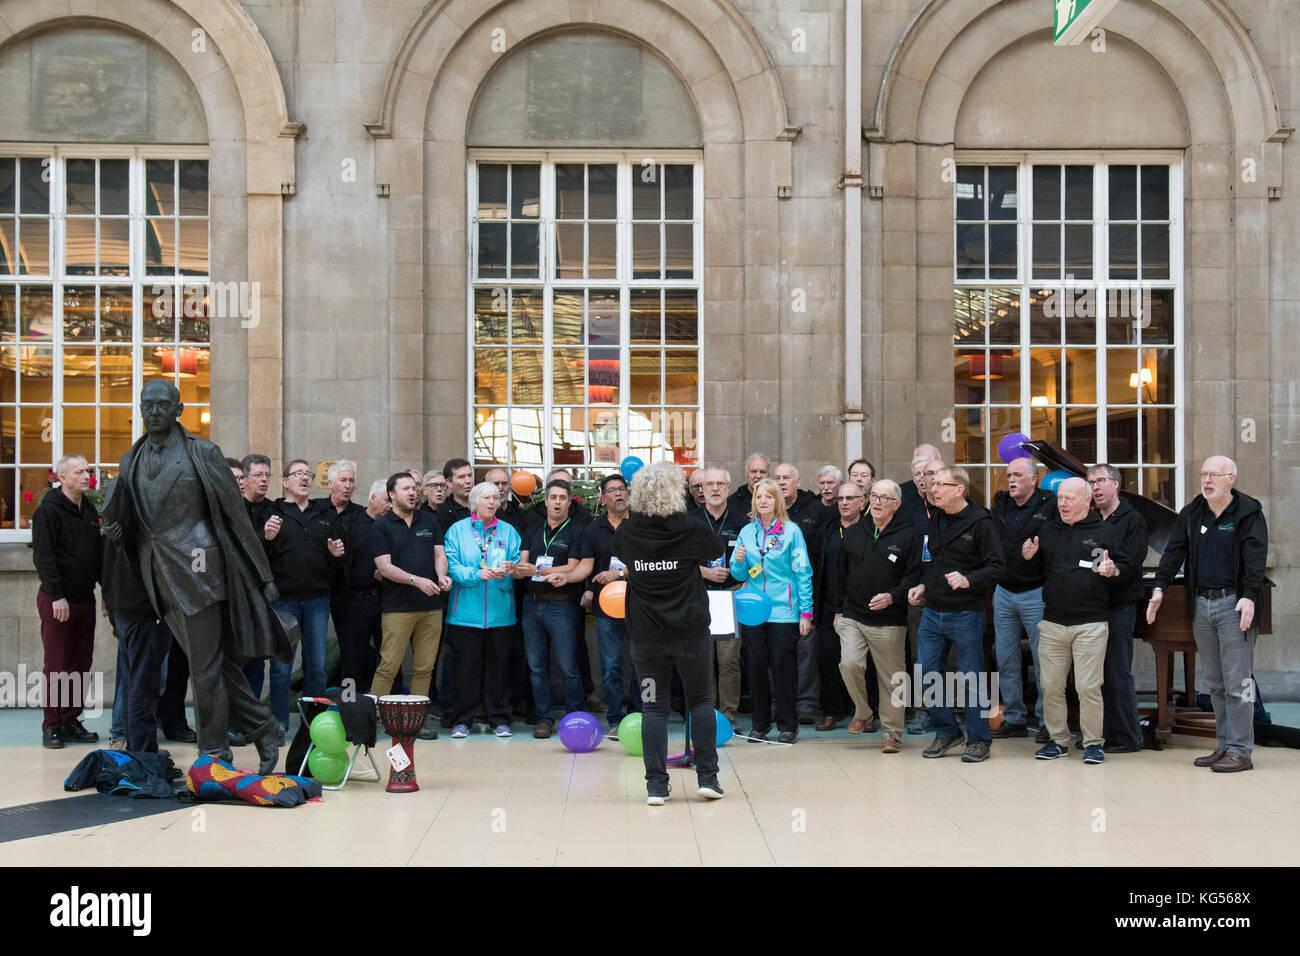 Buckinghamshire Men's Choir 'Seer Green Singers' performing in Hull Train Station in 2017 as part of - Stock Image